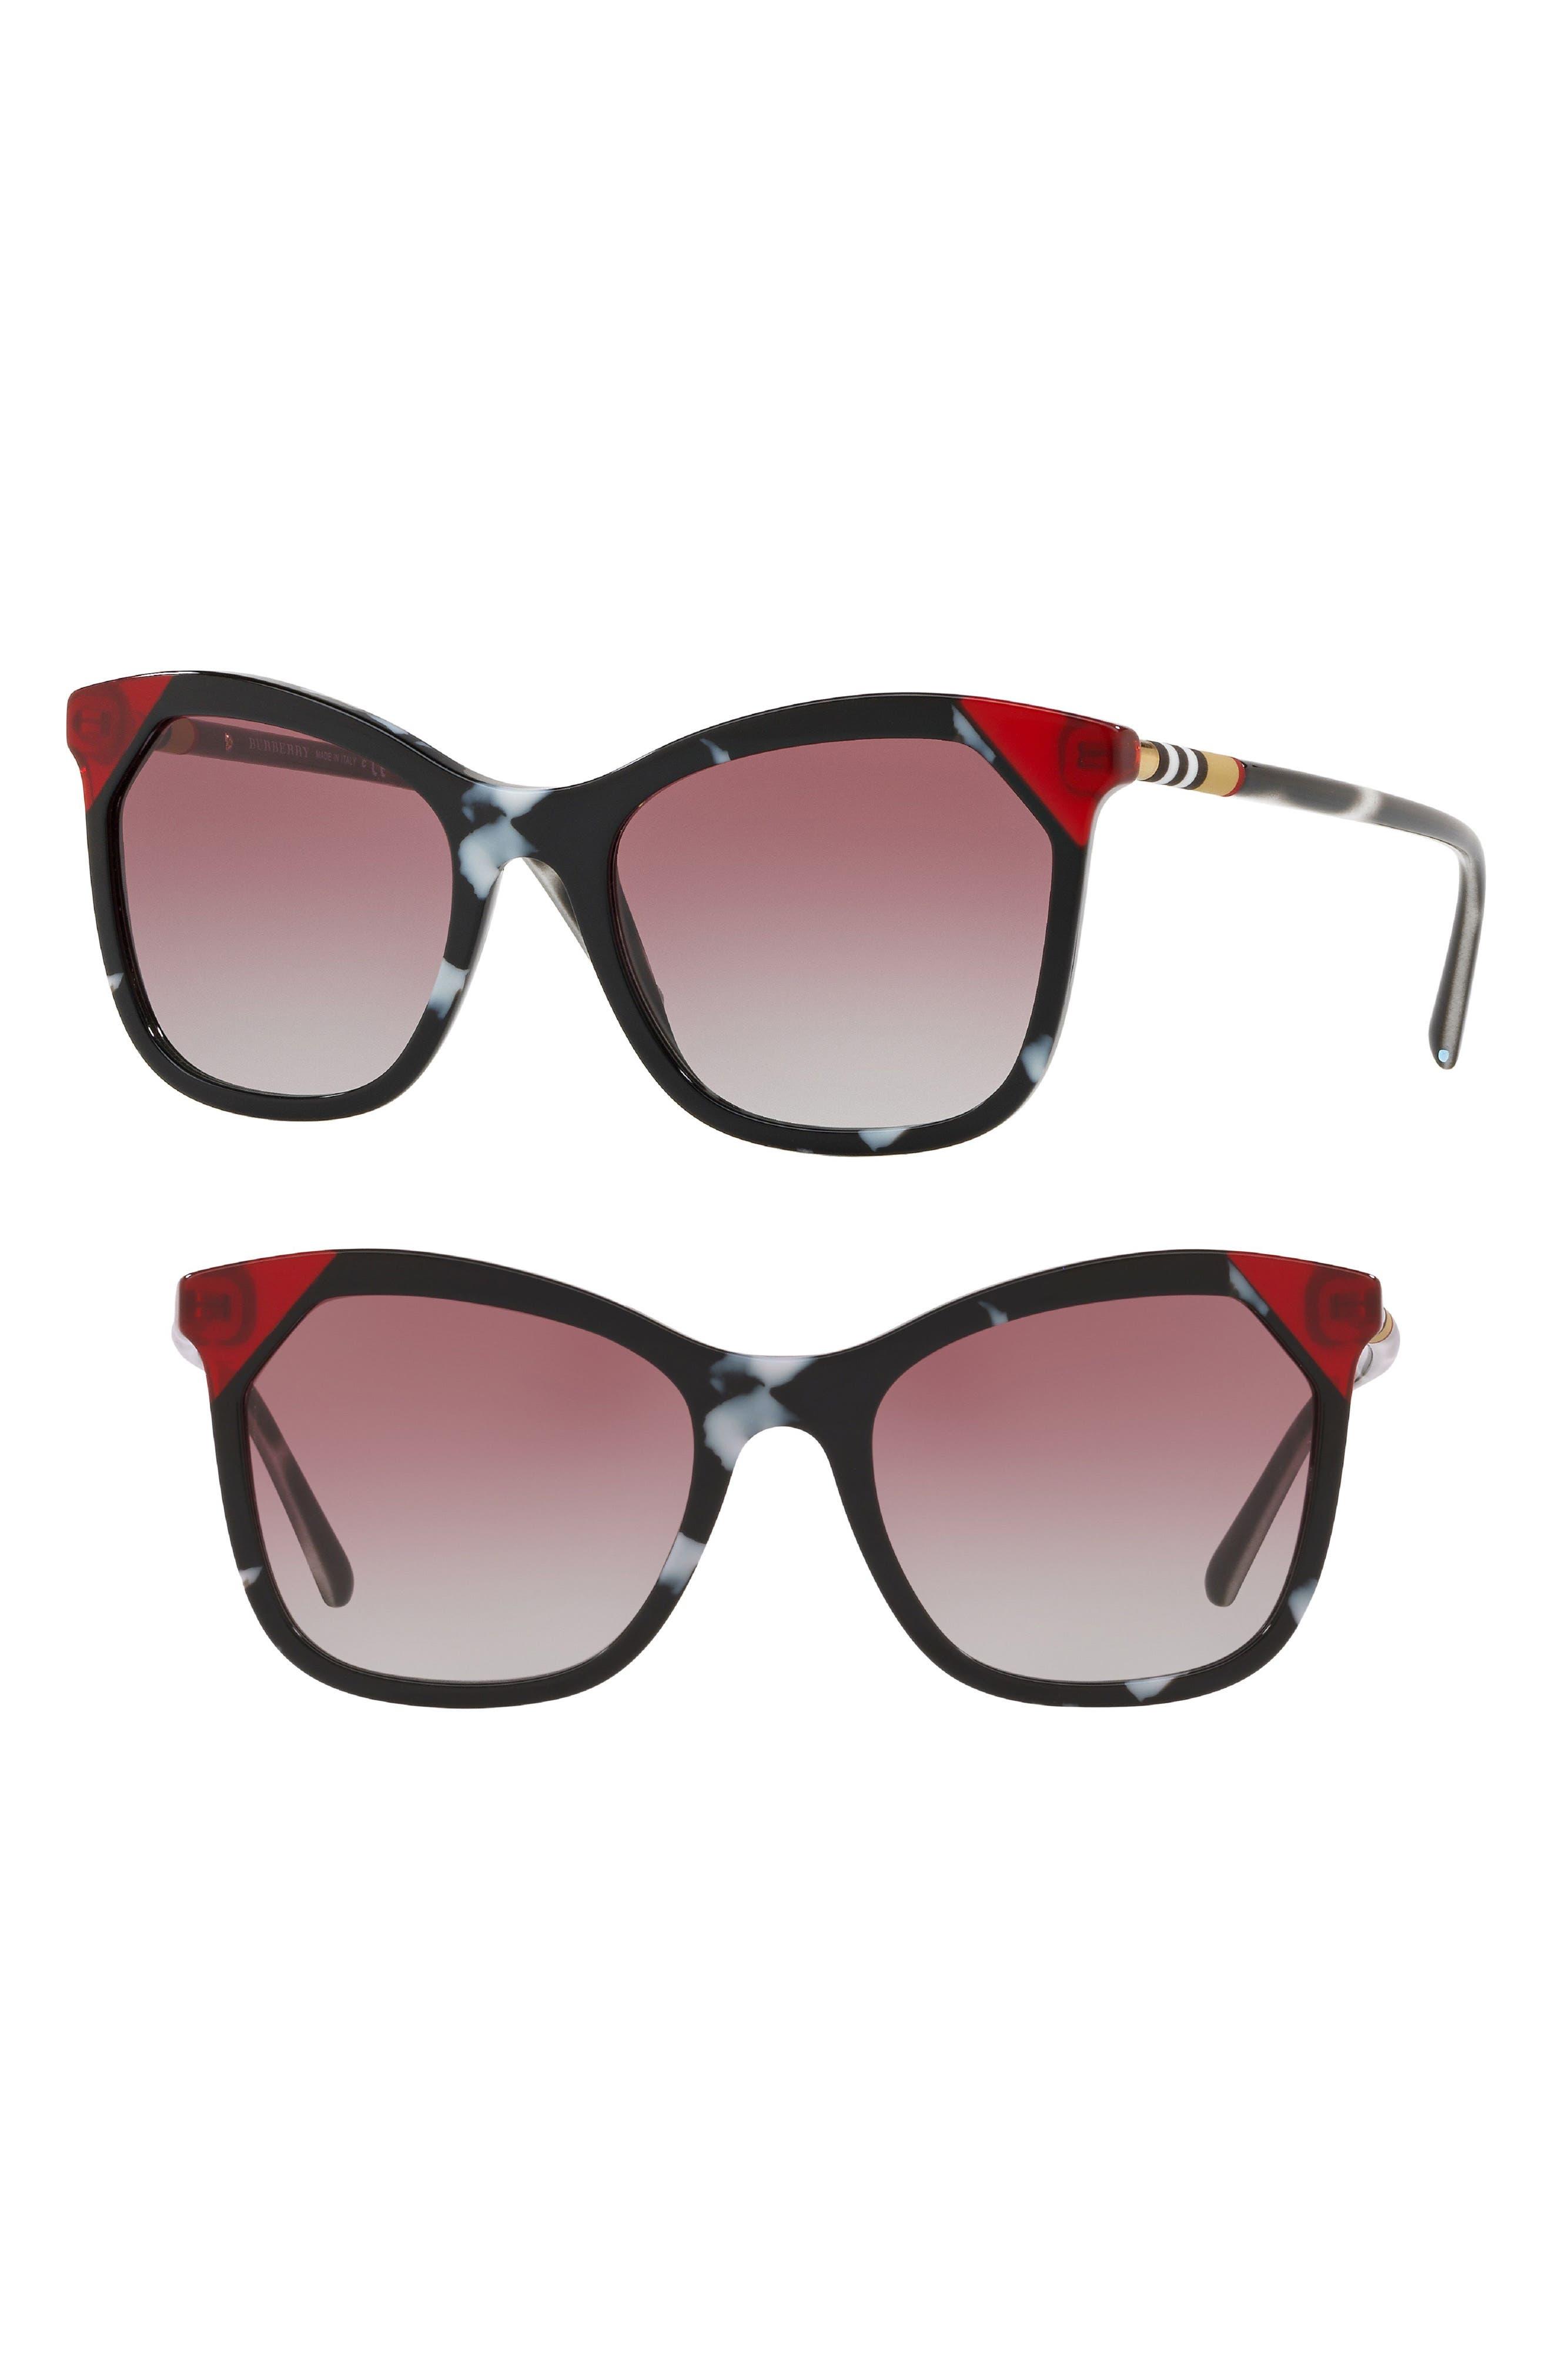 Heritage 54mm Square Sunglasses,                             Main thumbnail 1, color,                             111